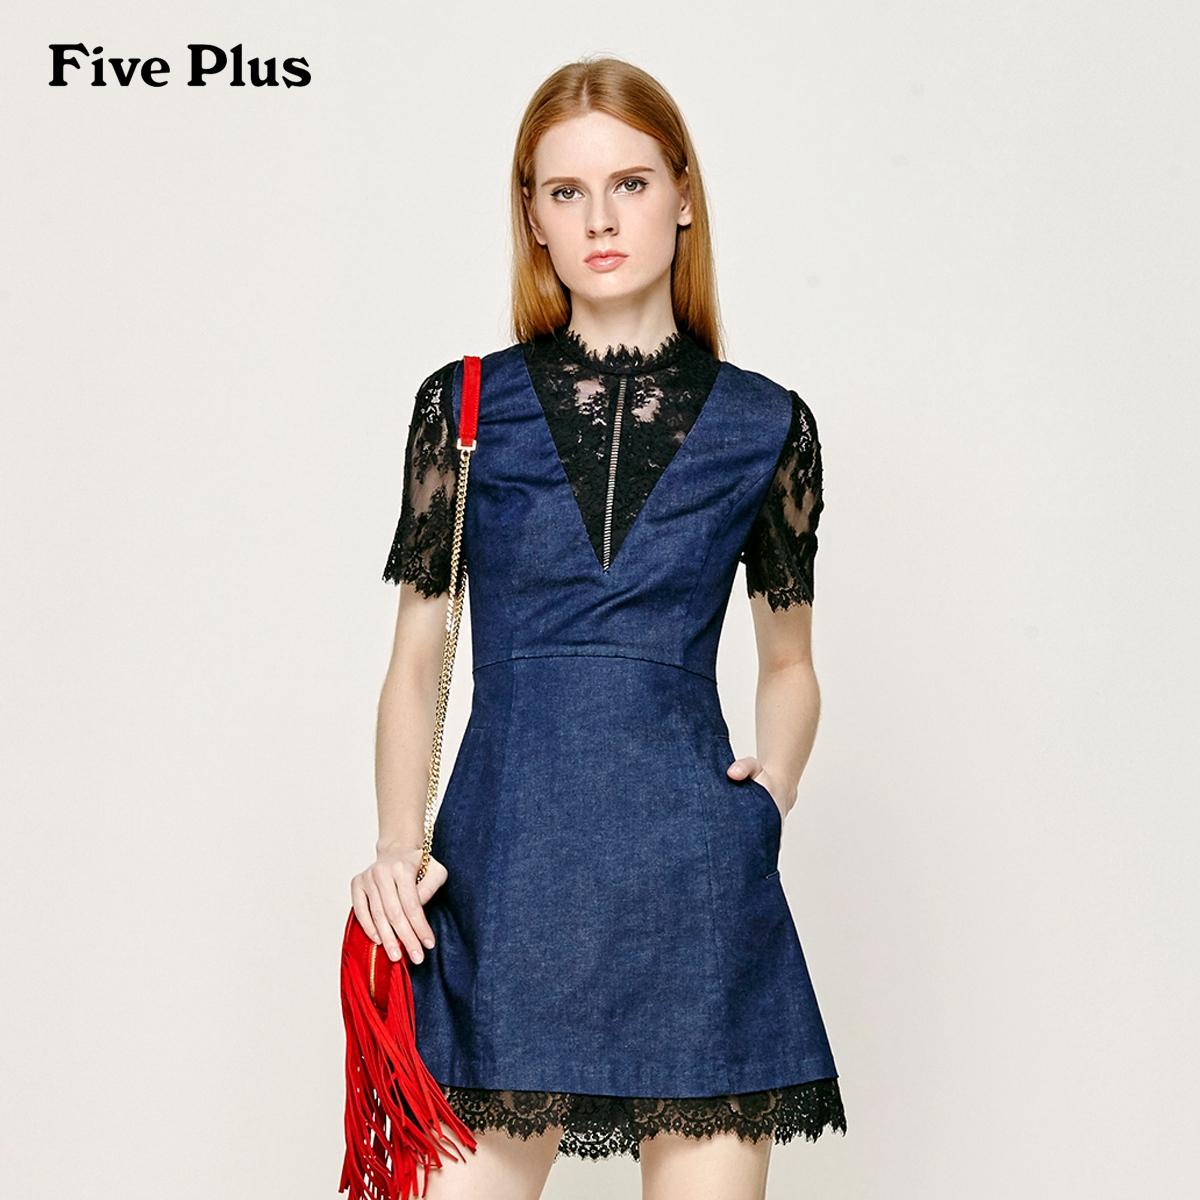 Five Plus新女夏装棉质拼接蕾丝高腰牛仔连衣裙短裙2JM2083130